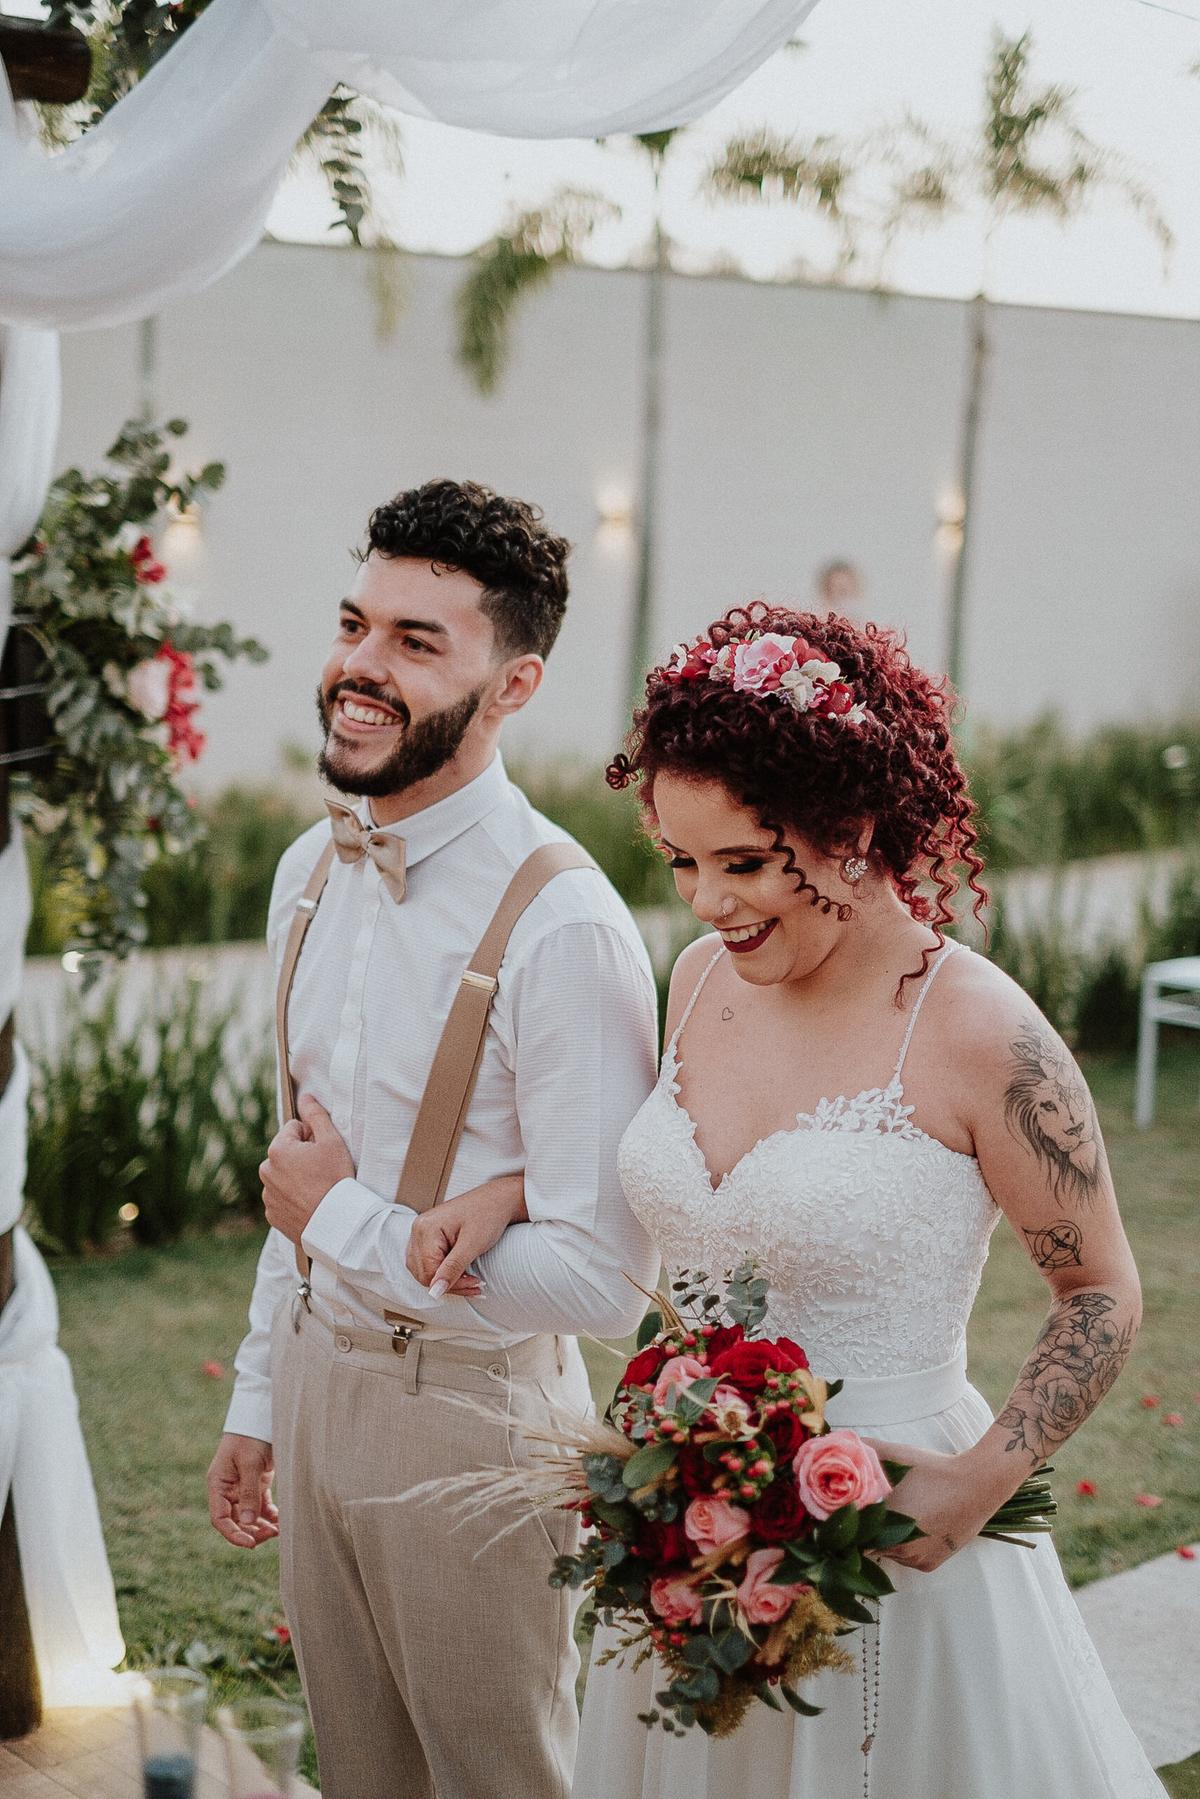 trajes de noivos ideias para casar casamentos com estilo fotos por ch caio henrique fotografo de casamento